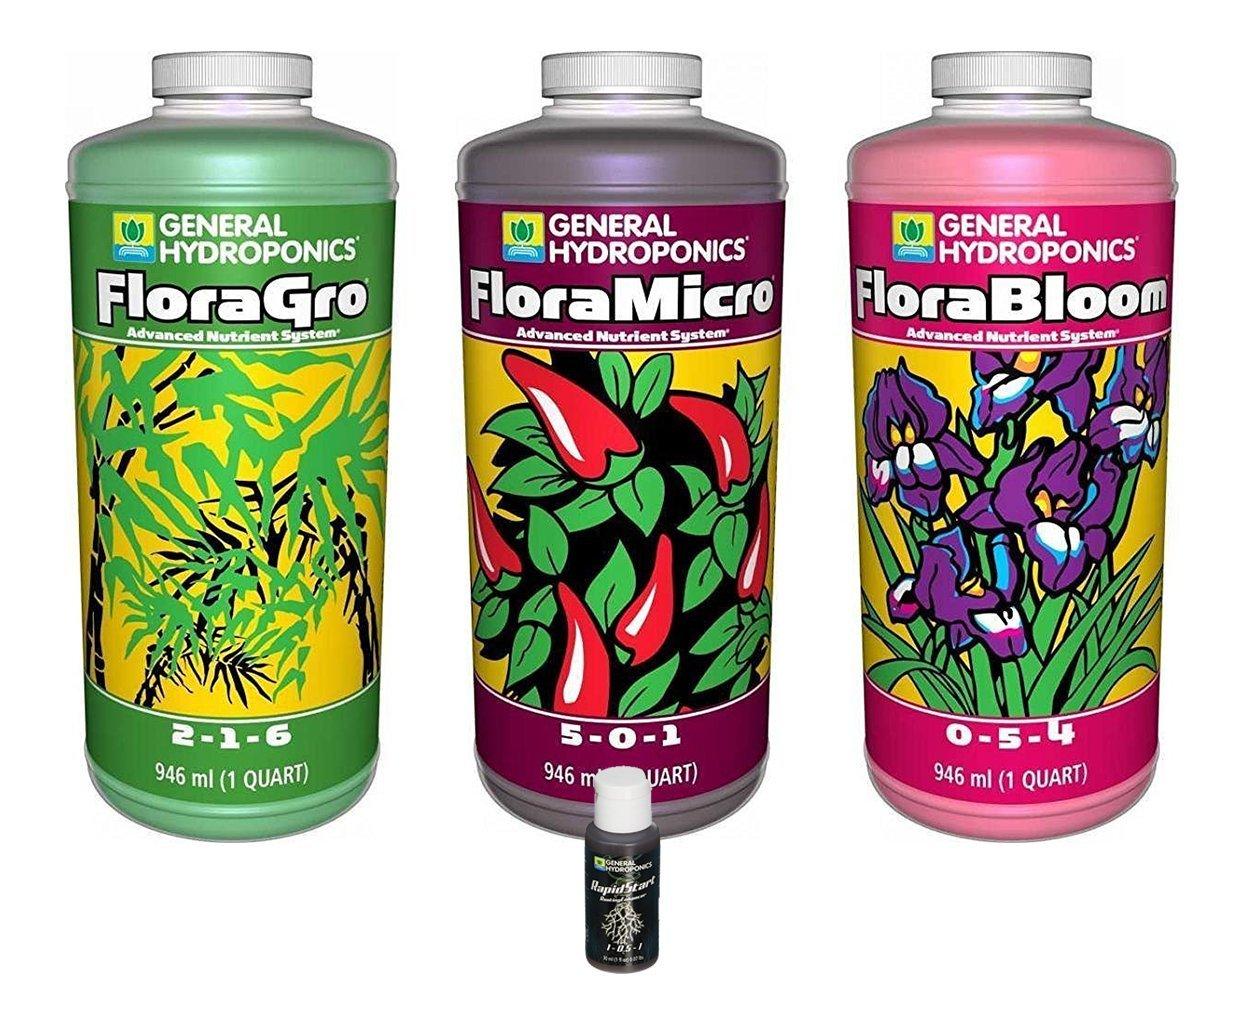 General Hydroponics GLCMBX0003 Floragro, Florabloom, Floramicro Fertilizer Set + 1oz Rapidstart, 1 Quart Combo Pack